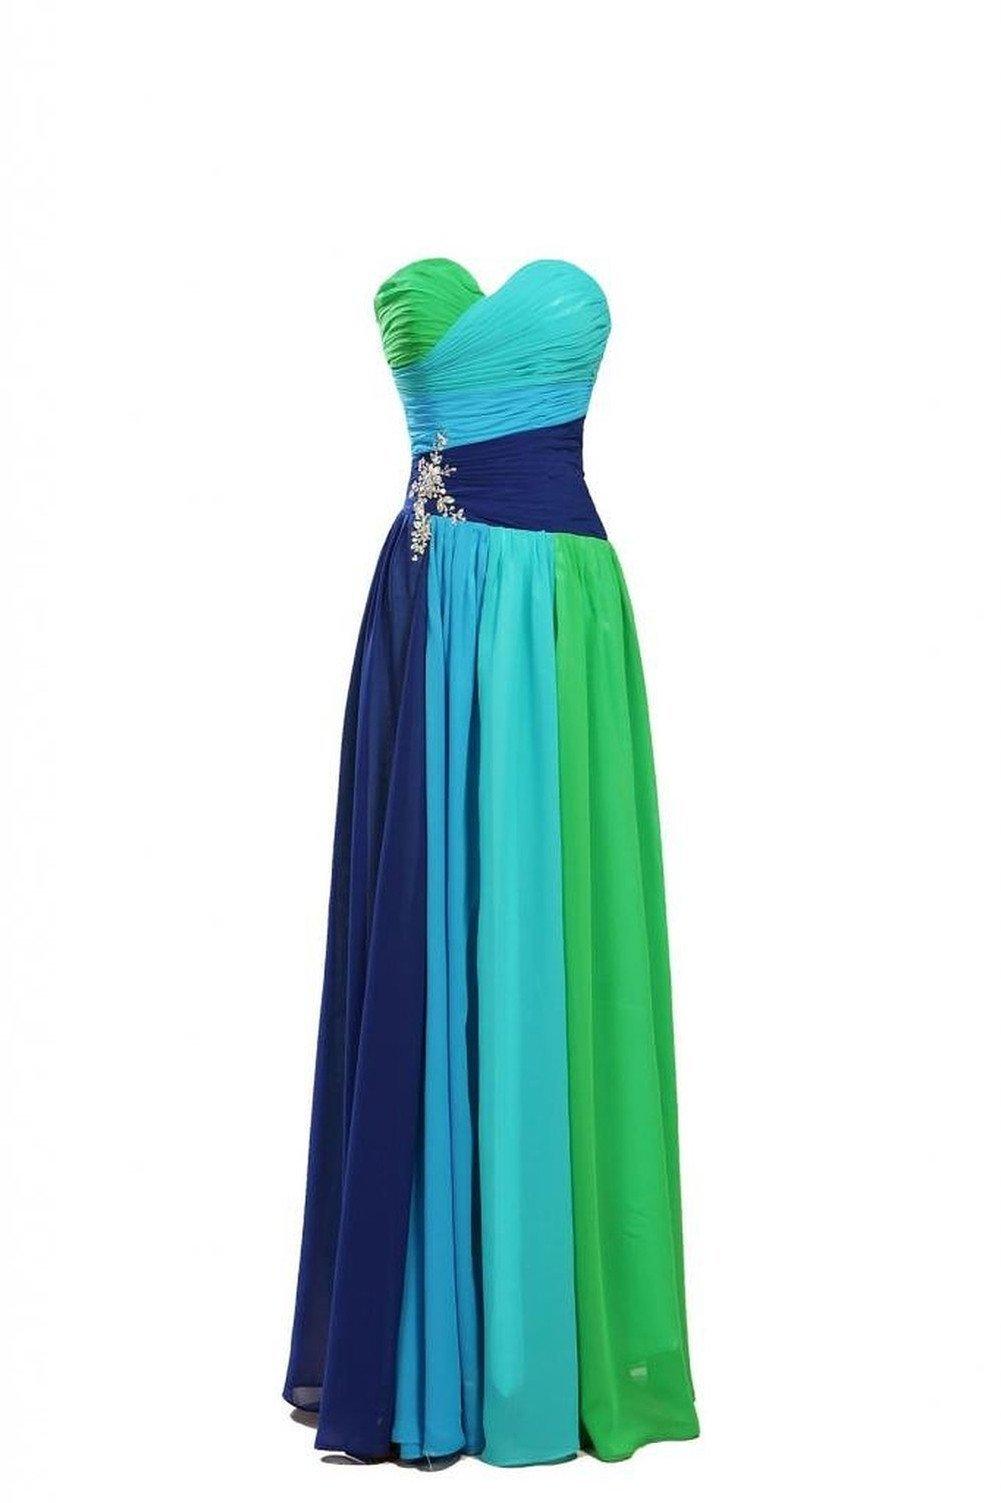 Dormencir Women's Rhinestone Colorful Long Bridesmaid Prom Evening Dresses (12) by Dormencir (Image #4)